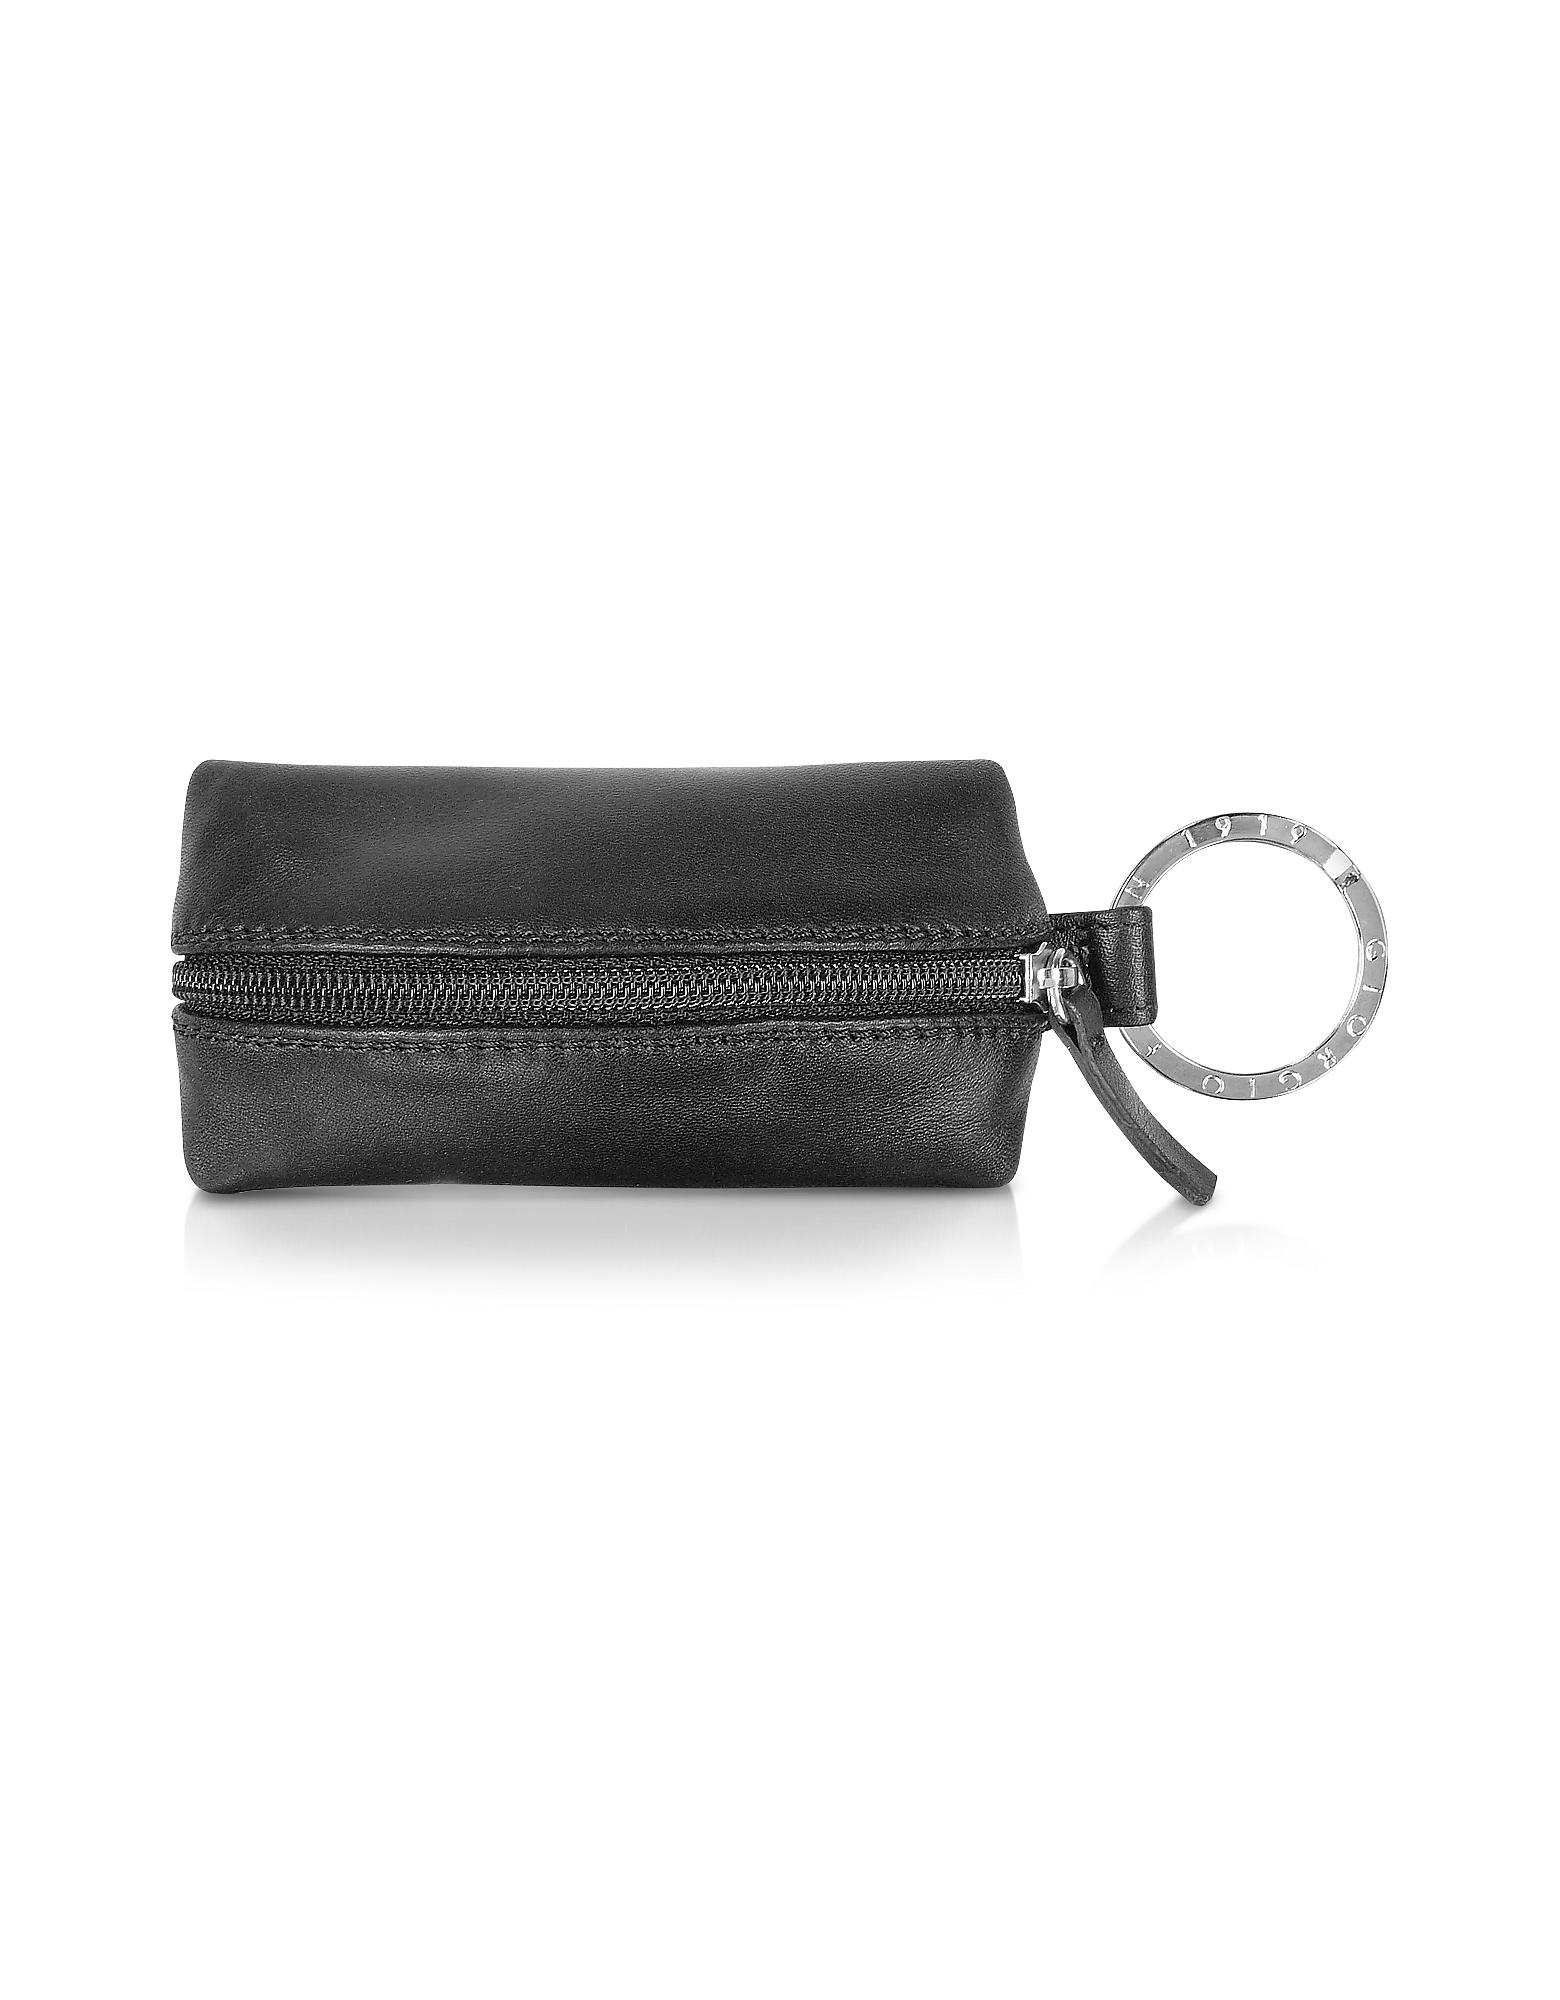 Classica - Black Calfskin Key Fob w/ Compartment